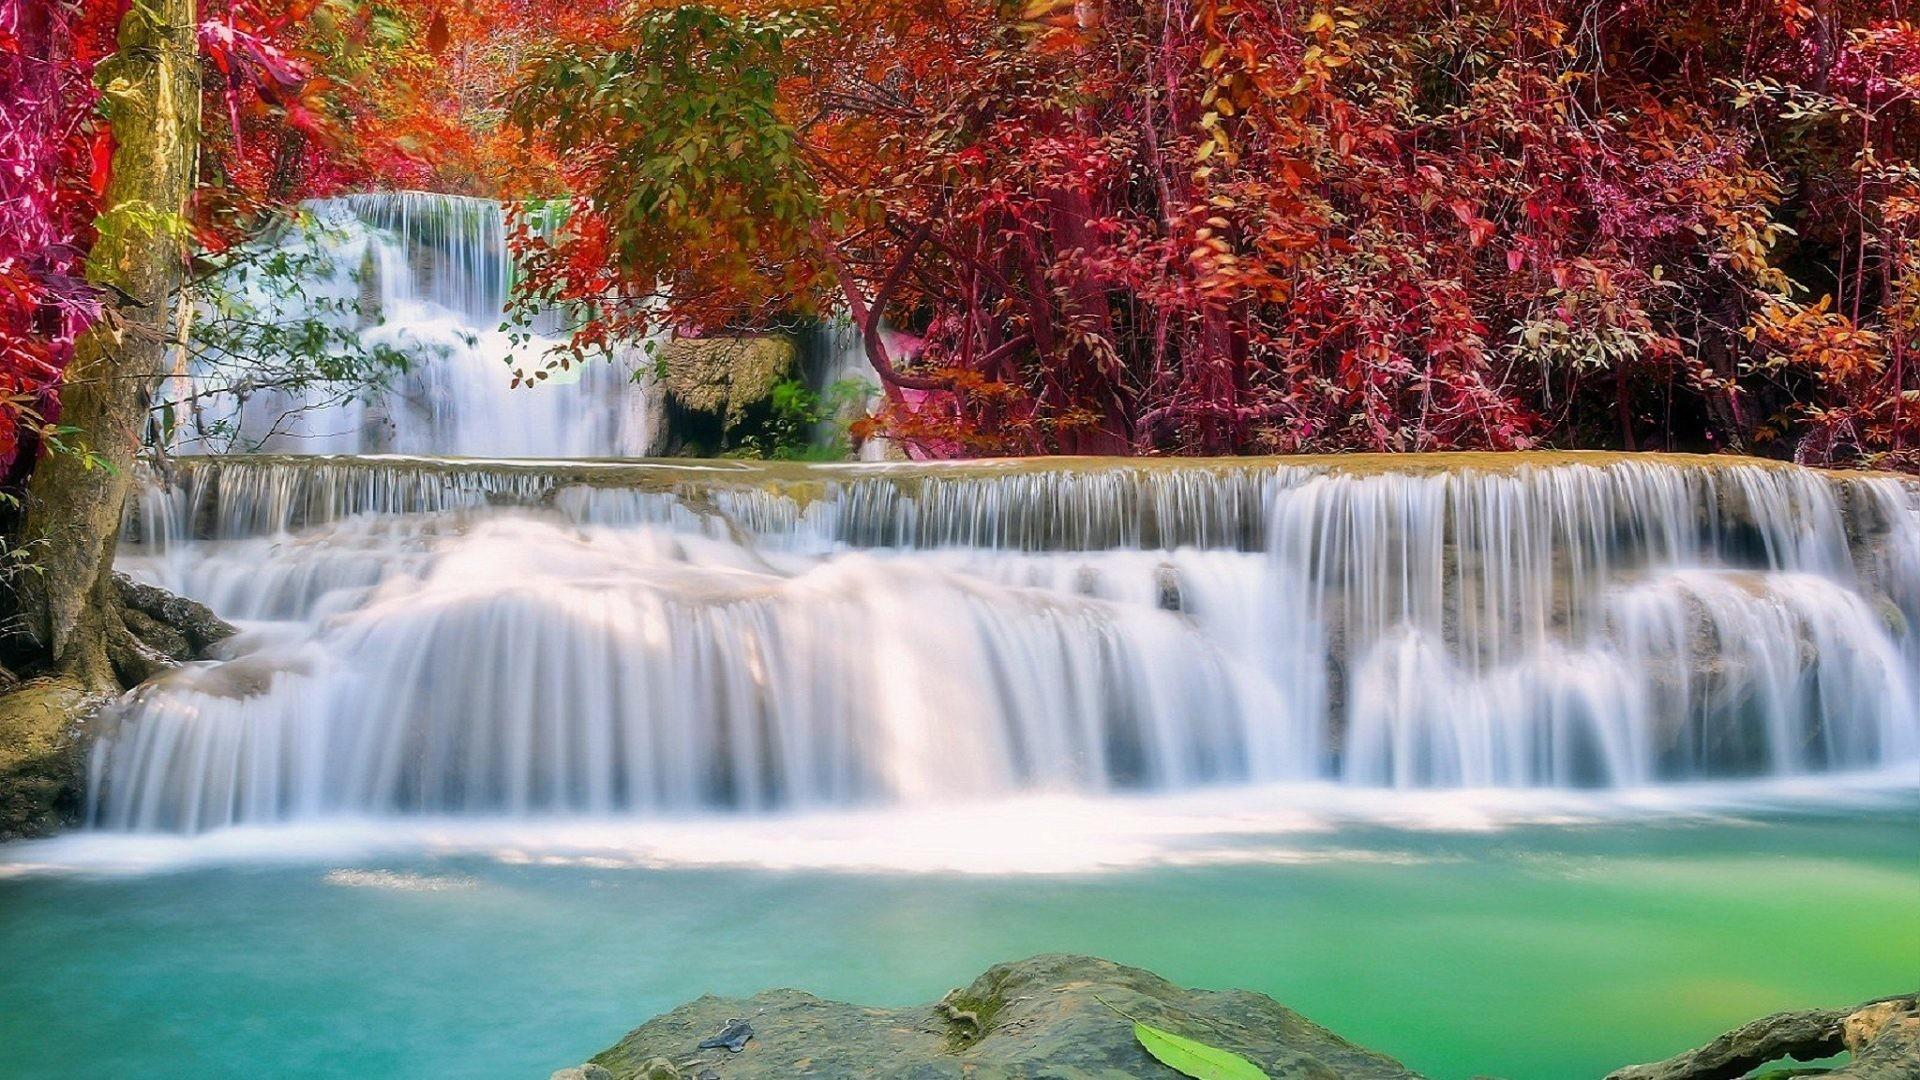 Downloaded Tag – Autumn Season Paradise Splendid Beautiful Four Waterfall  Attractions Plants Trees Stunning Pre Love